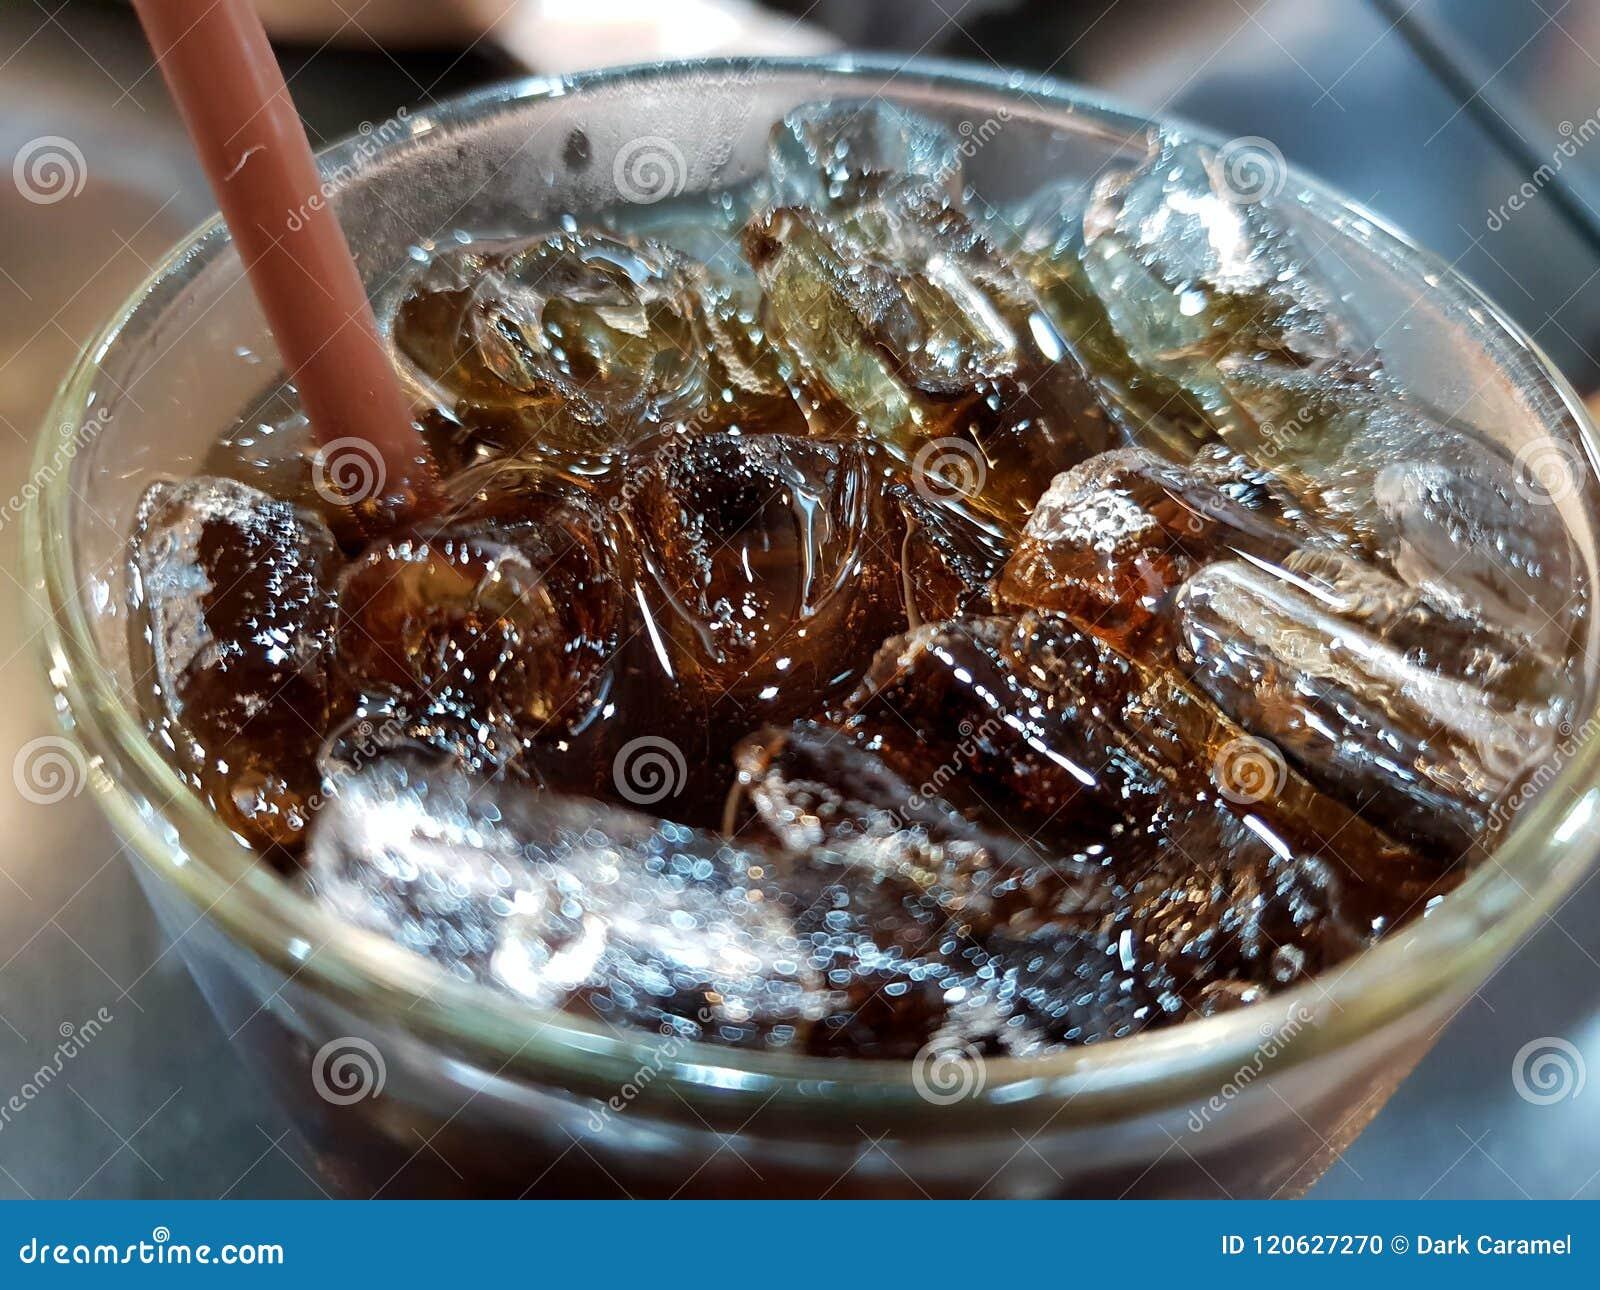 Hoogste mening van kola met ijs in een glas